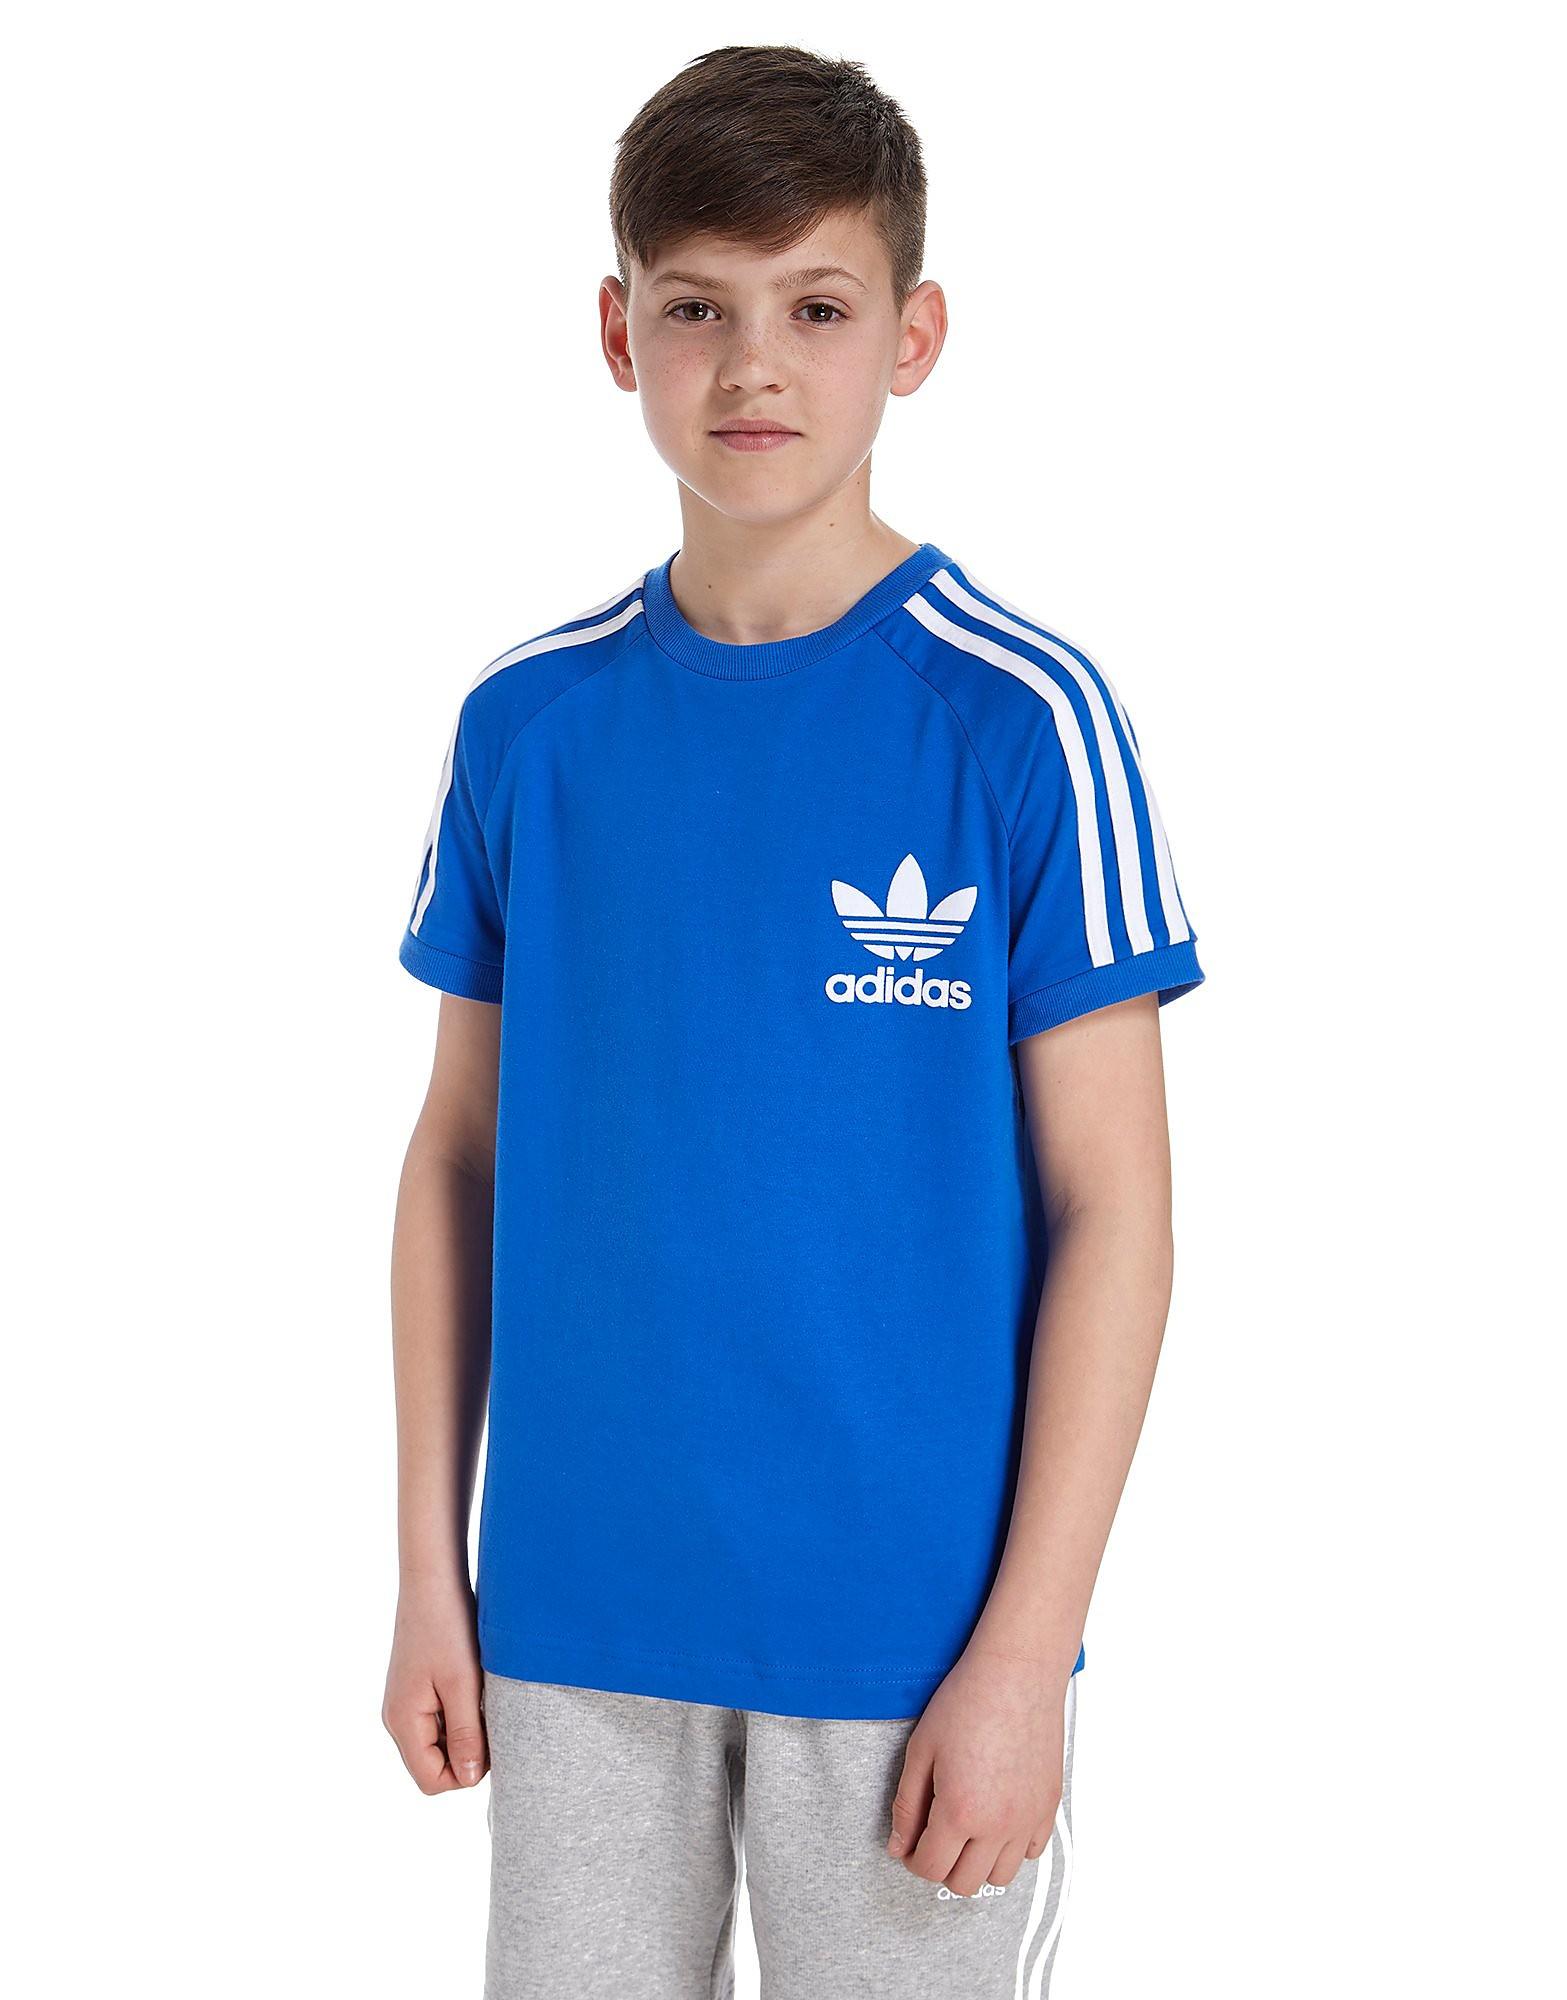 adidas Originals California T-Shirt til Juniorer